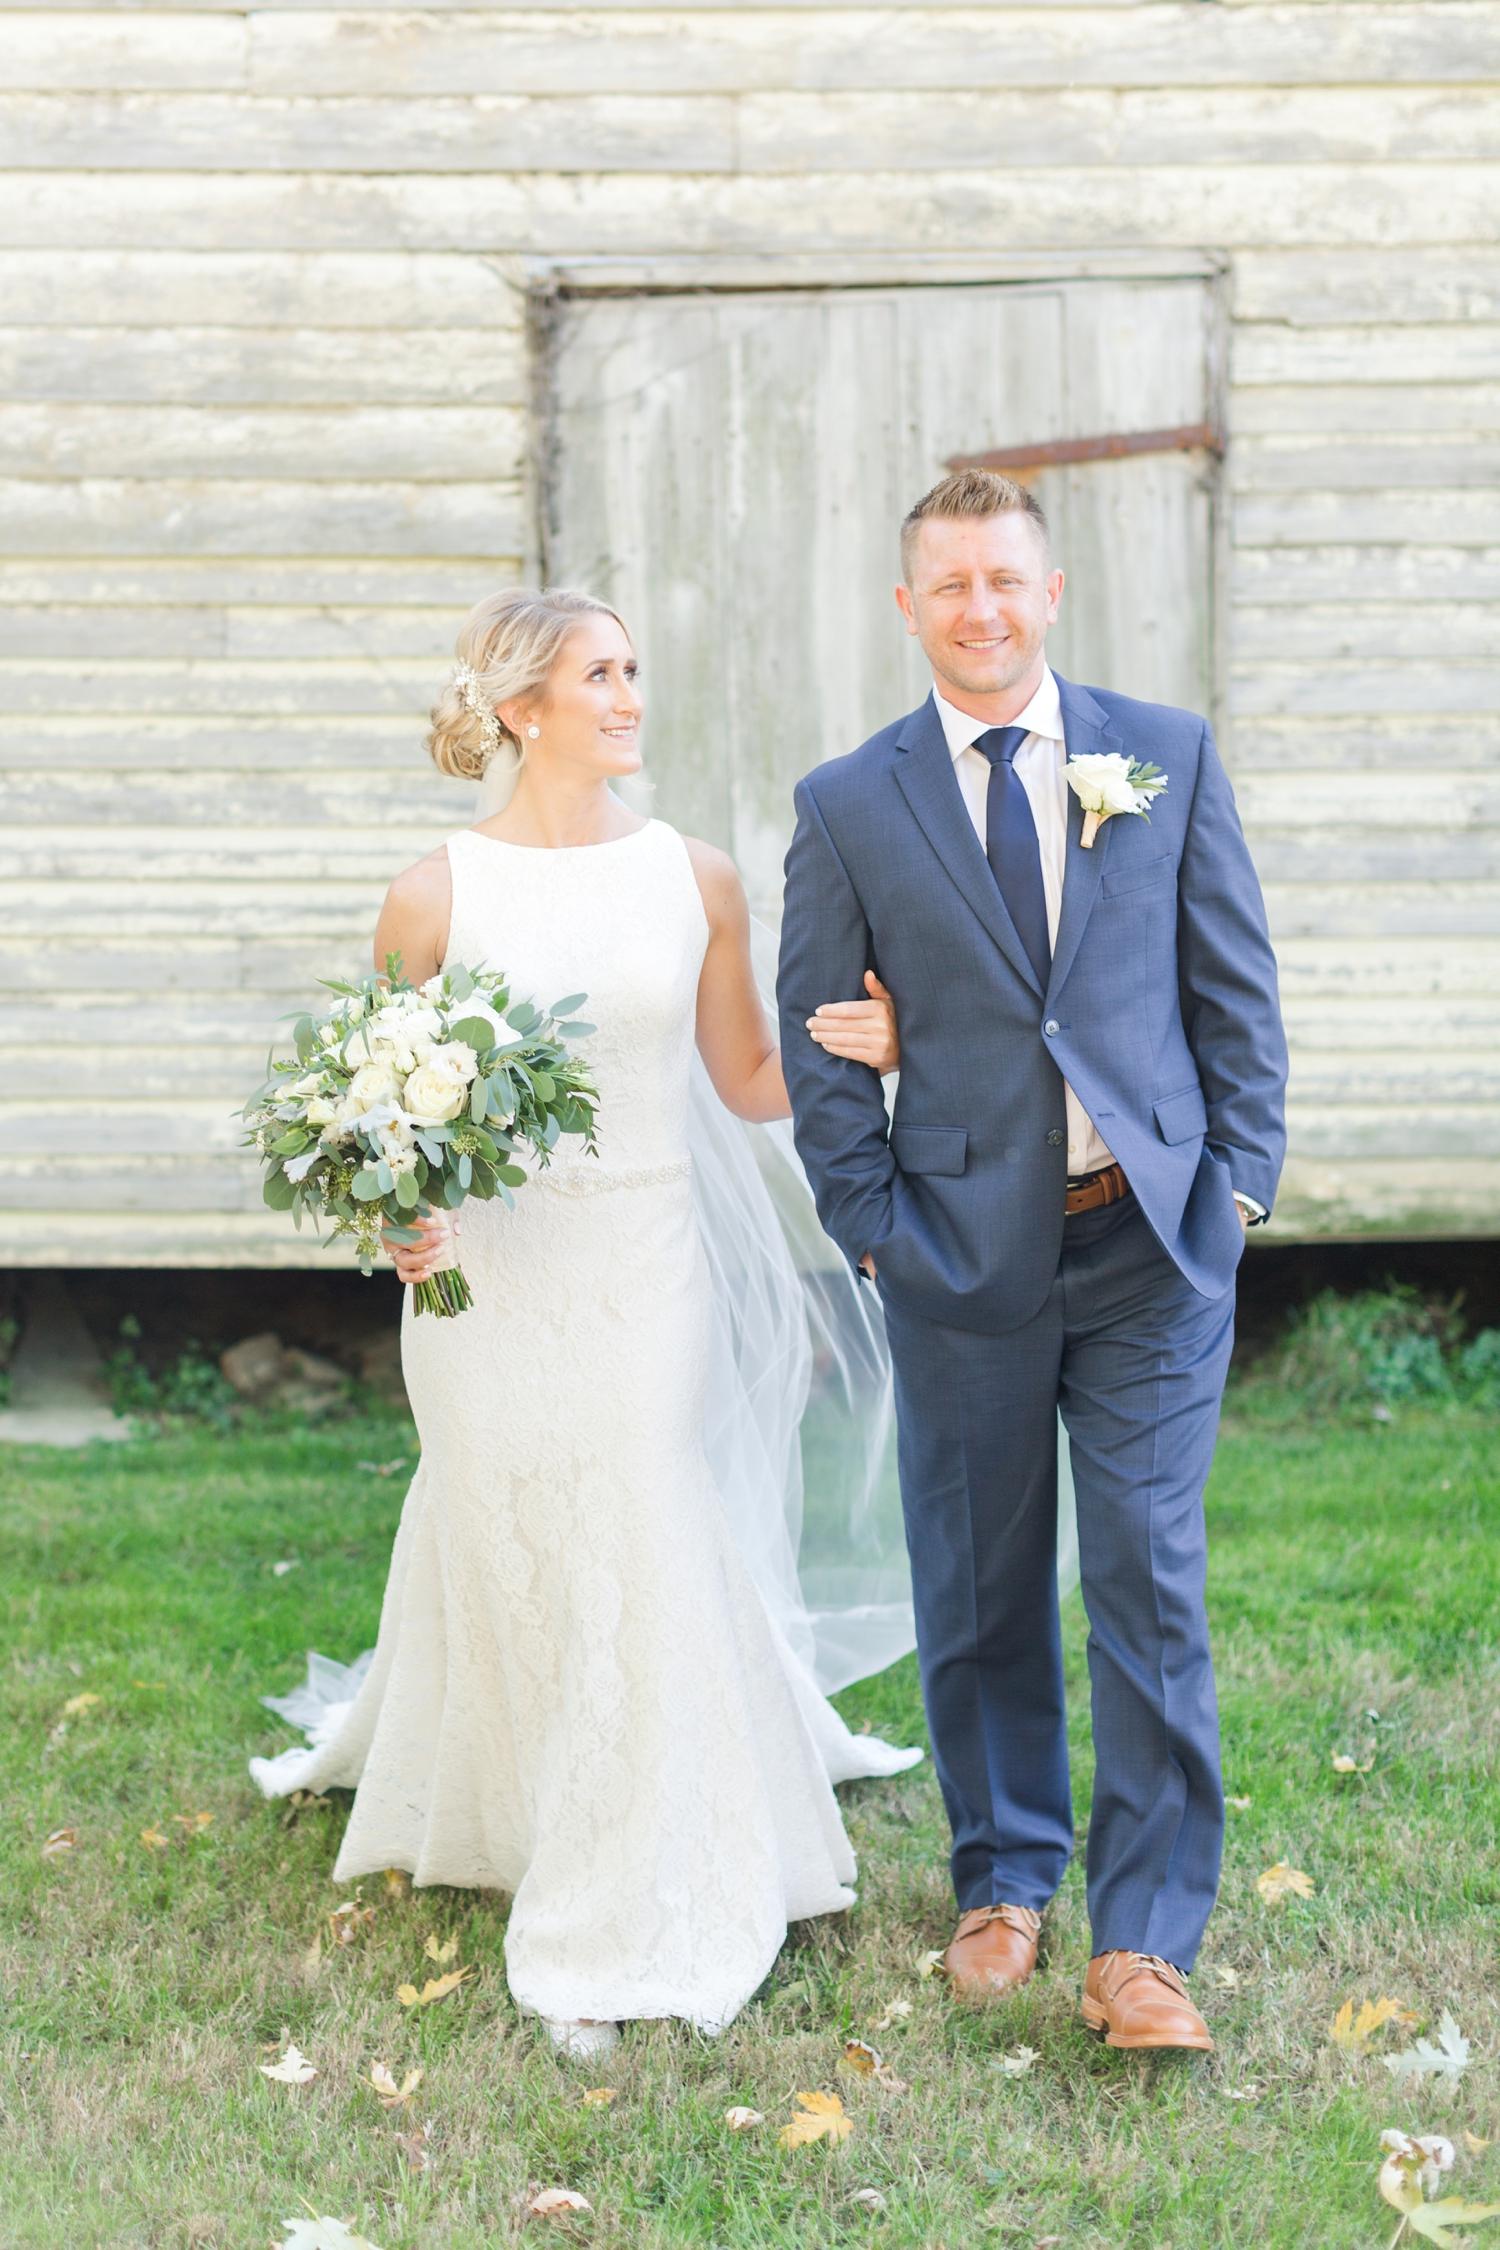 Wojciechowski Wedding-212_the-oaks-waterfront-inn-wedding-easton-maryland-wedding-photography-anna-grace-photography-photo.jpg